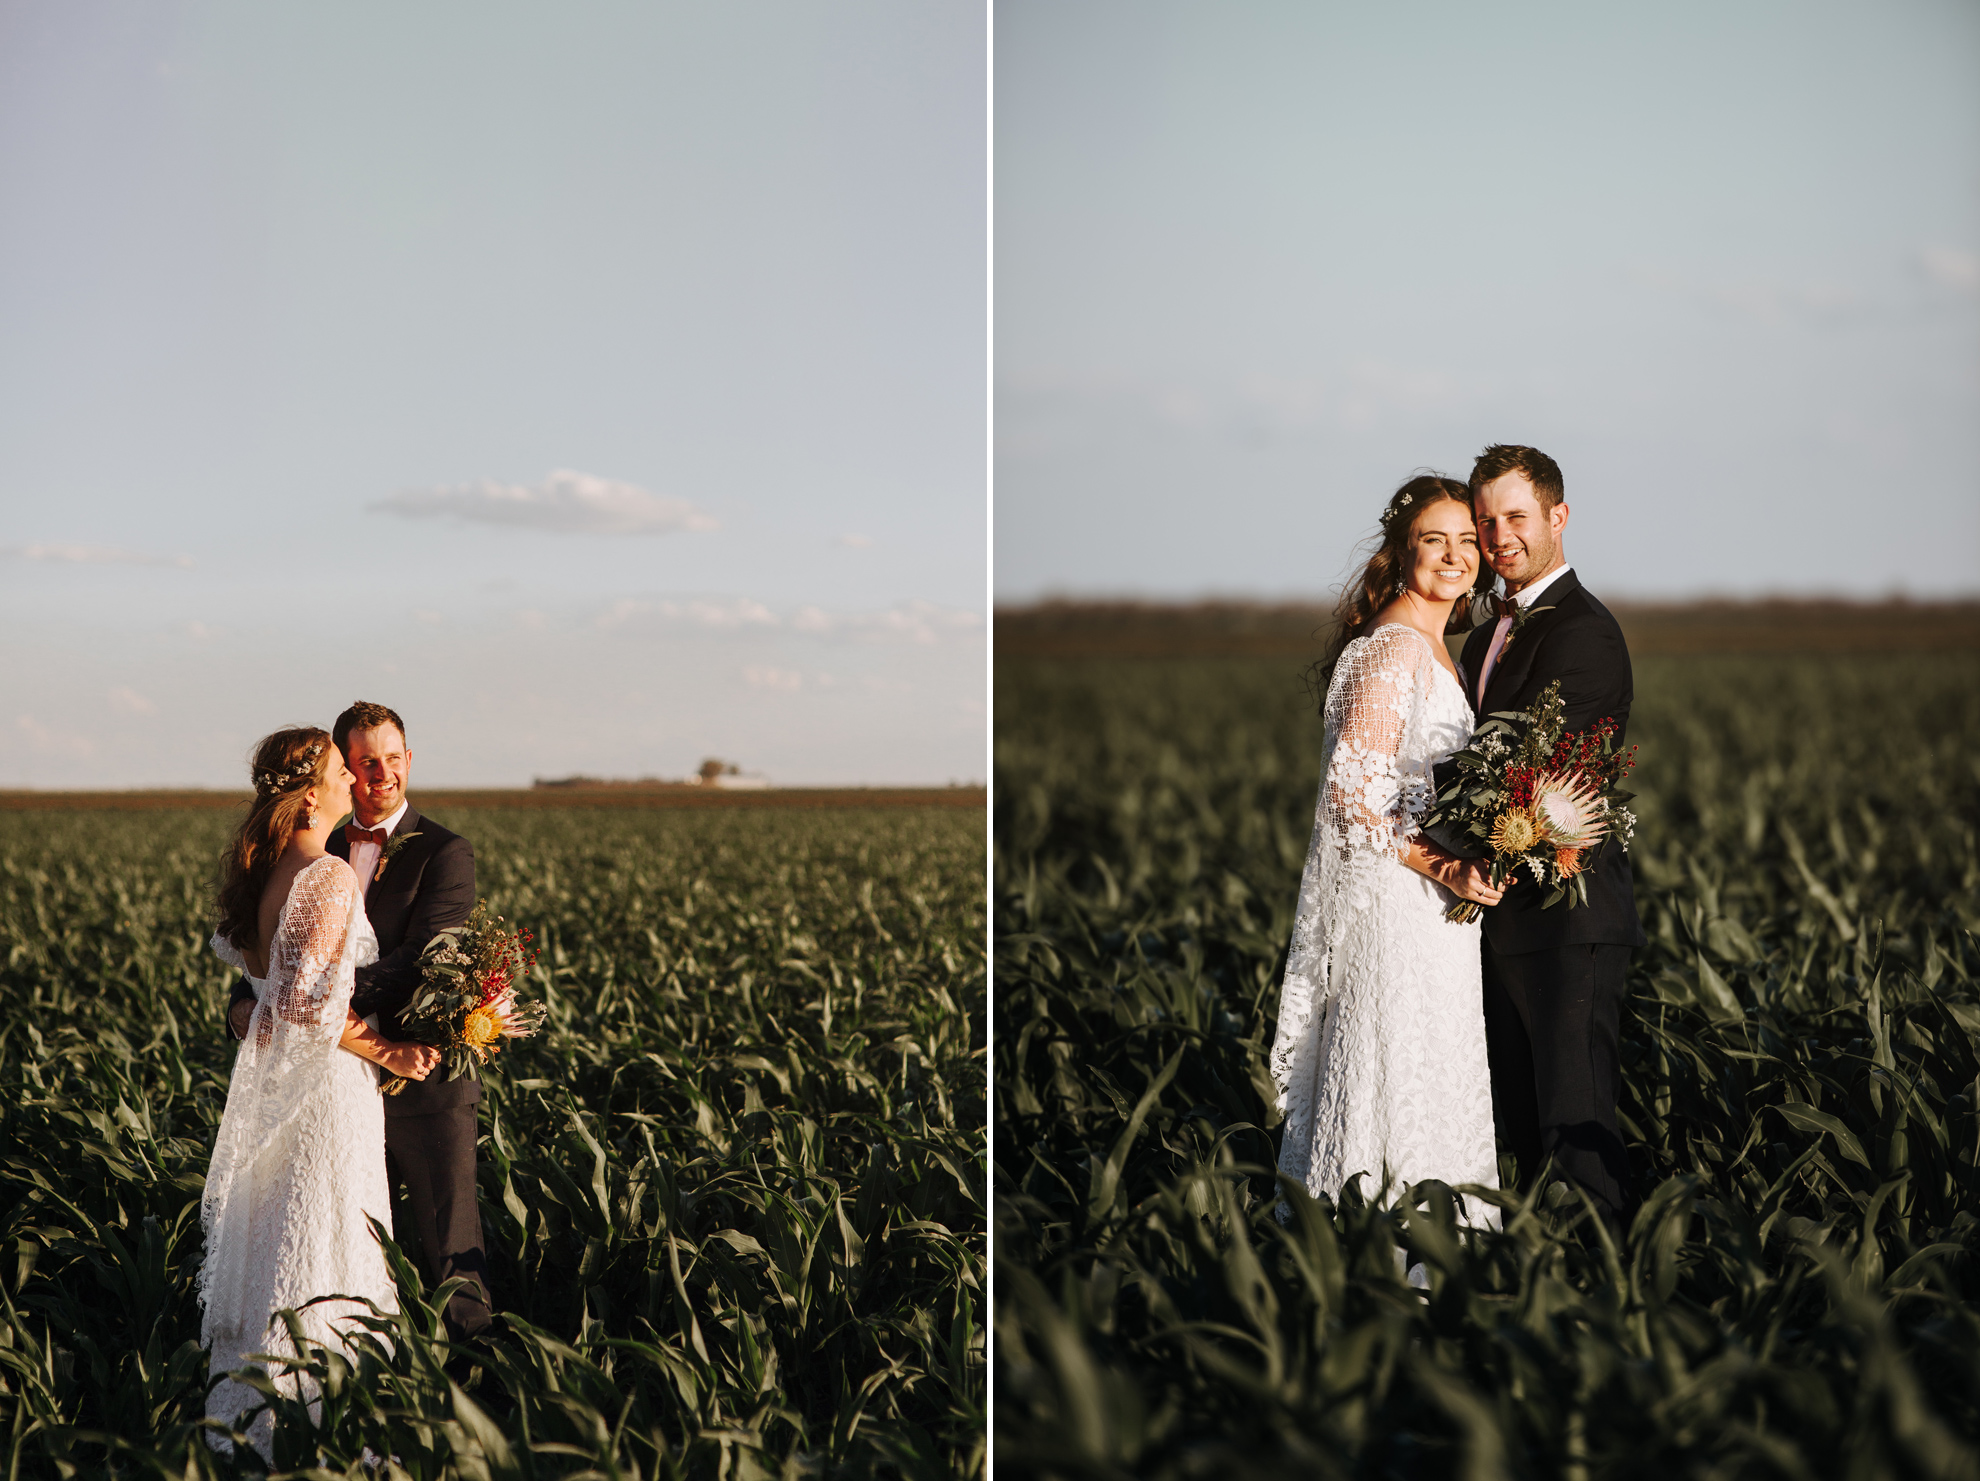 060-Jason_Jessie_Dalby_Country_Wedding.jpg